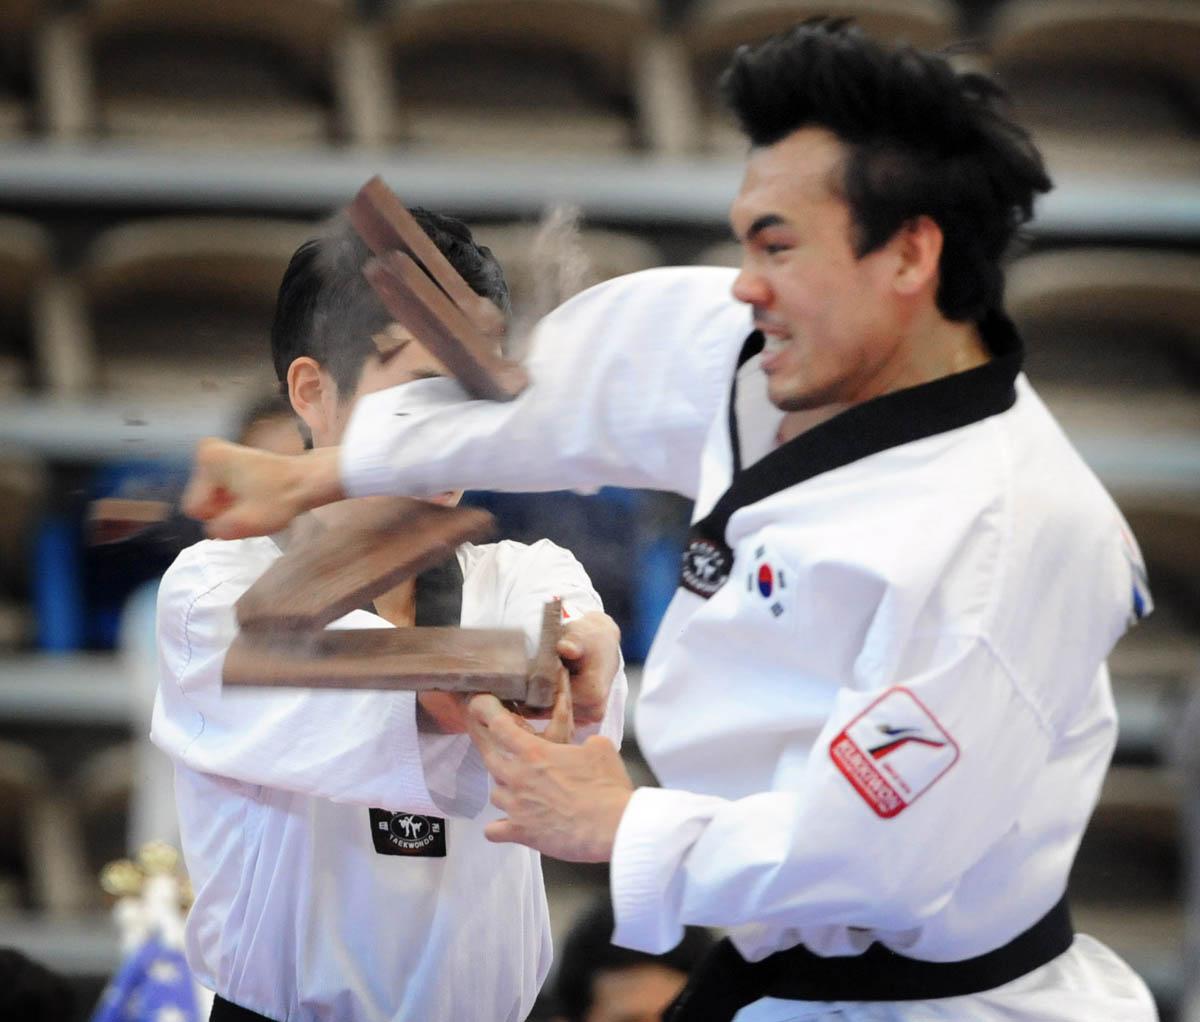 Maryland Governor's Cup Taekwondo Championship